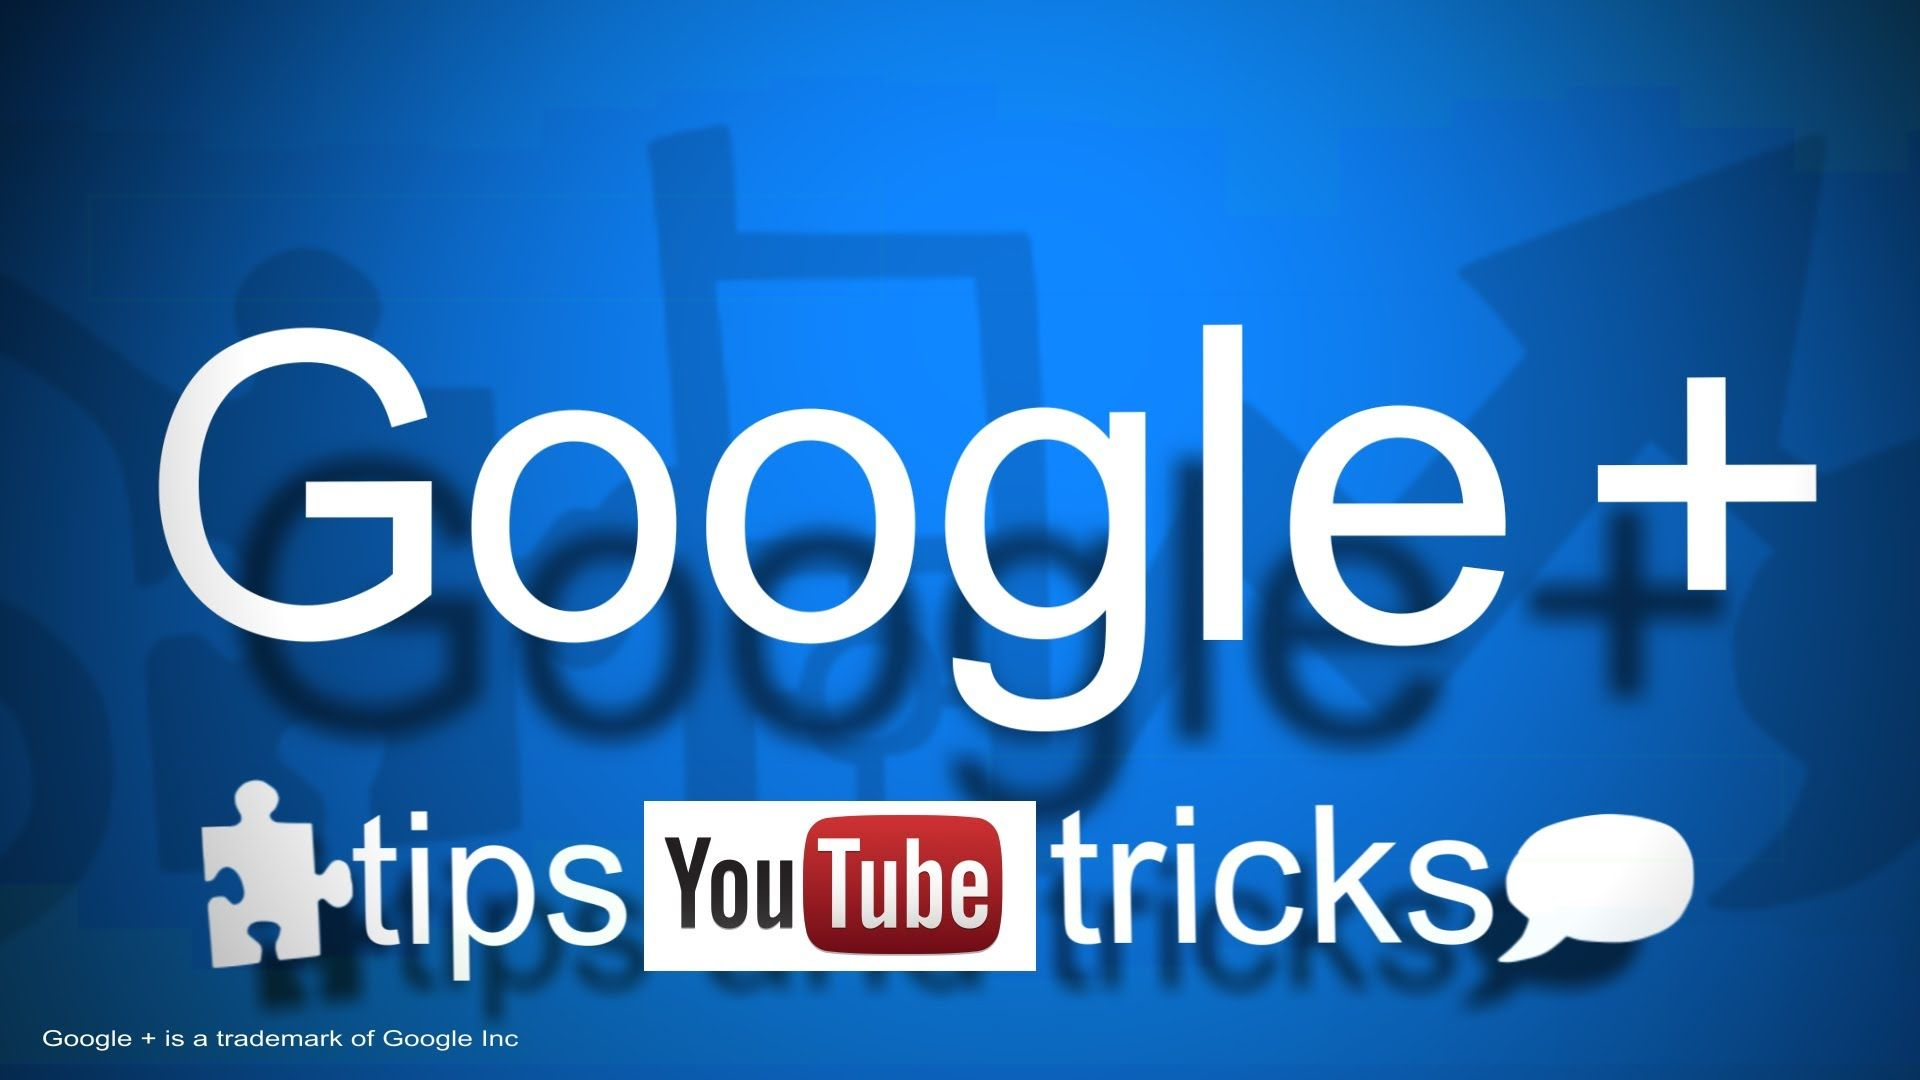 How to create a hangoutonair, integrate with a Google+